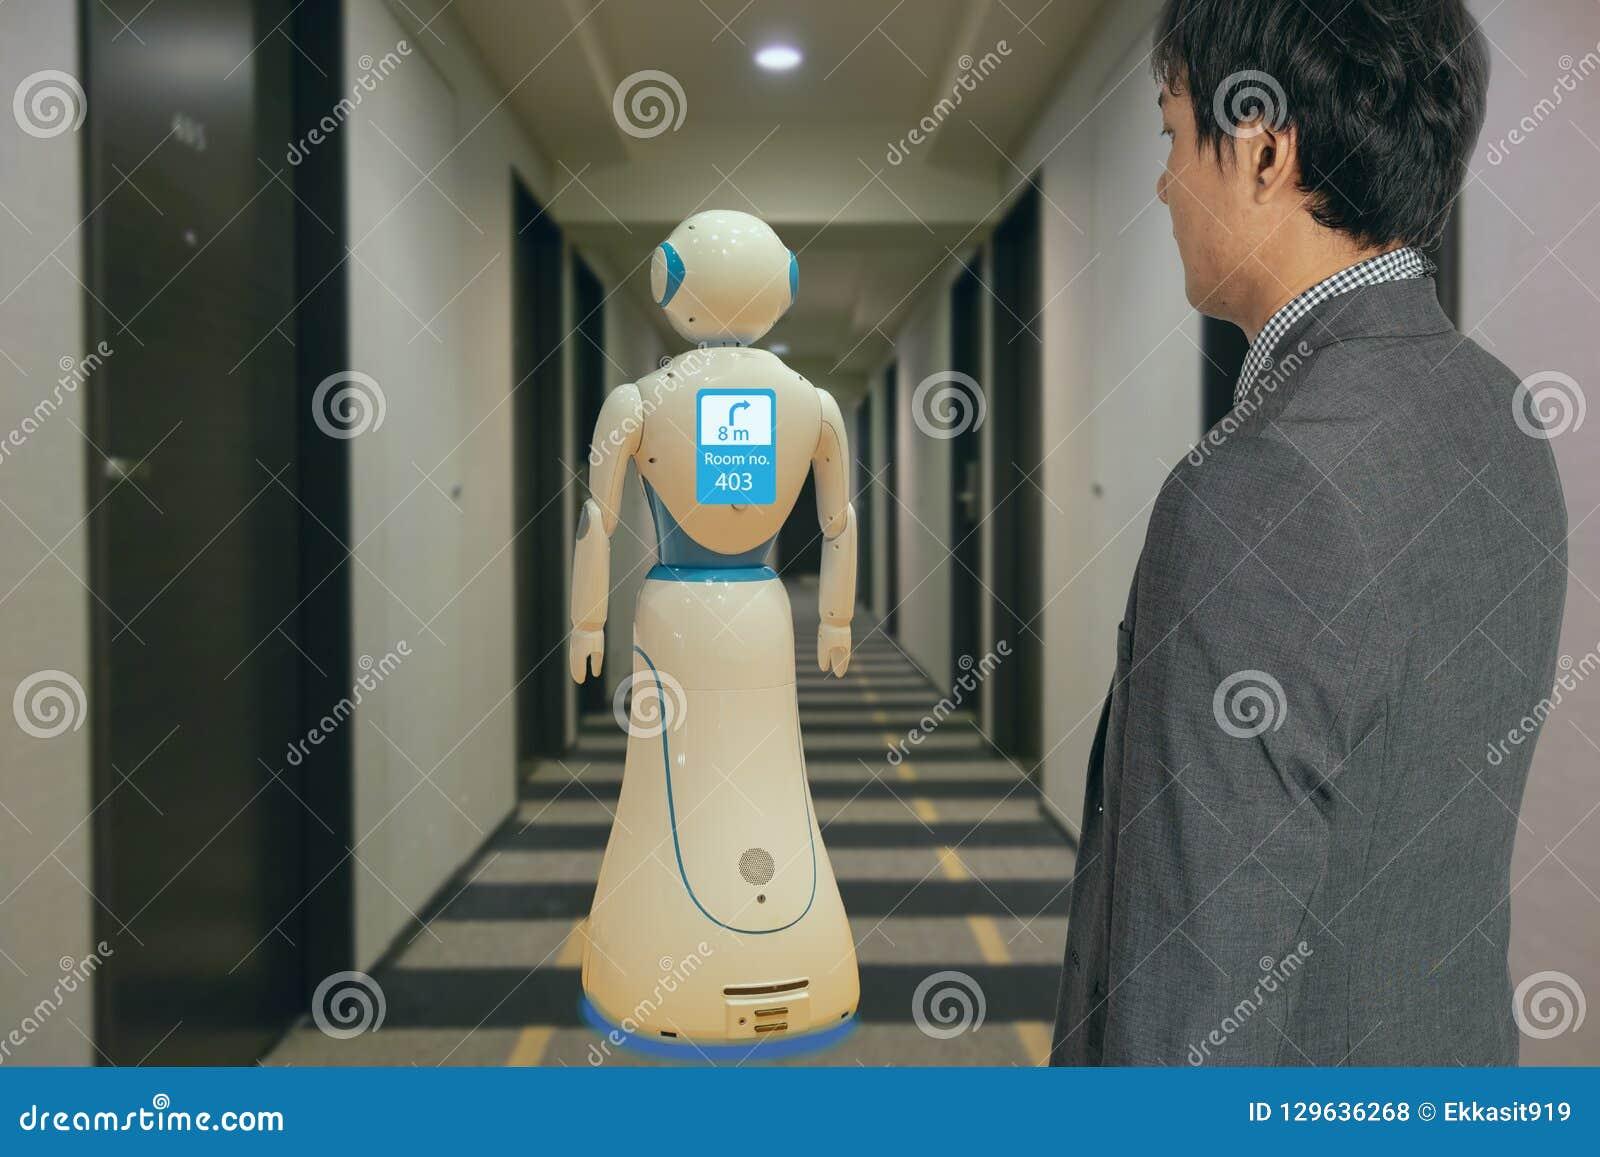 Smart hotel in hospitality industry 4.0 technology concept, robot butler robot assistant use for greet arriving guests, deliver cu